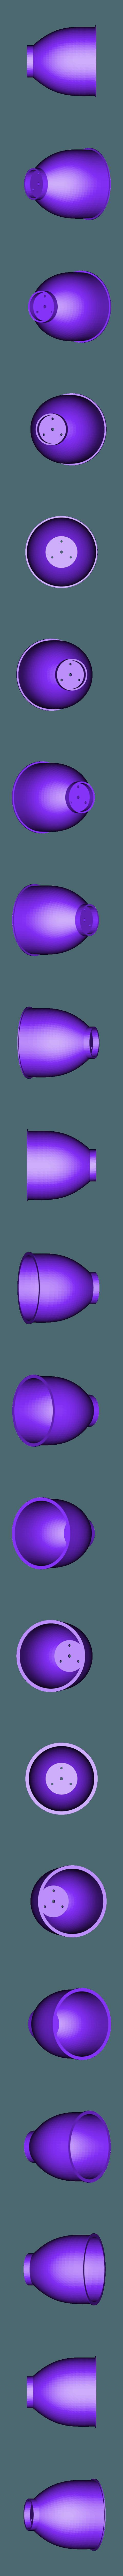 faro proyecto.STL Download free STL file headlamp for 4mm LED lights • 3D printing object, jru